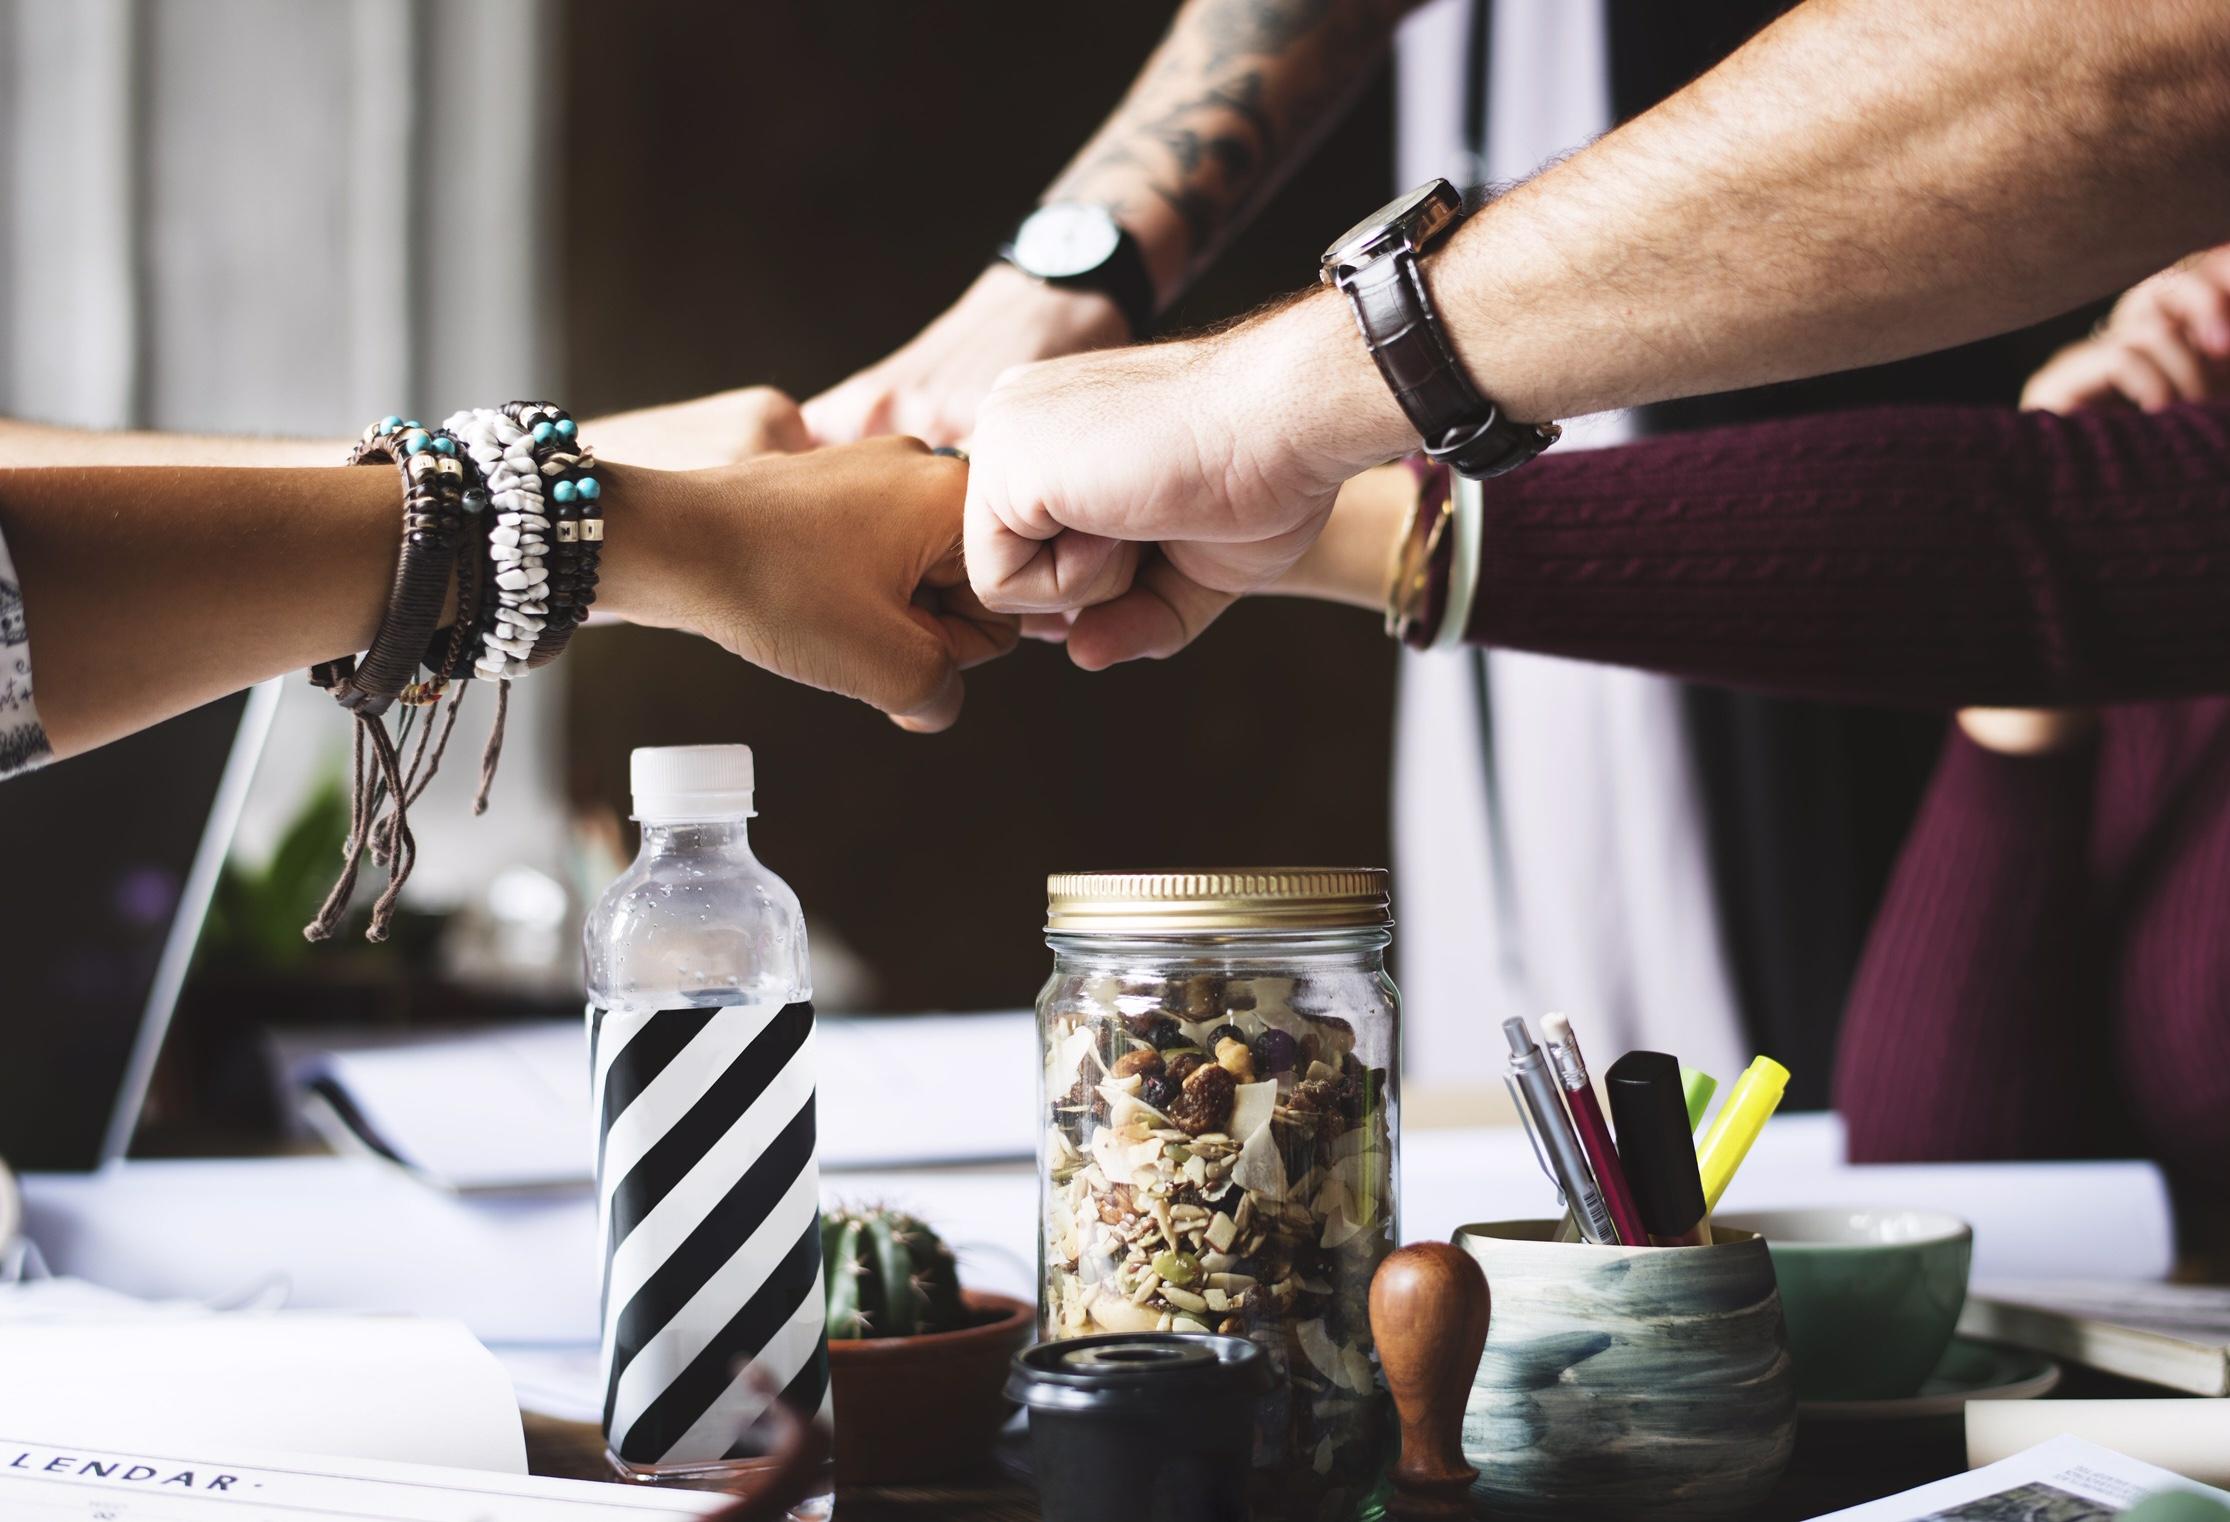 Marque employeur - fidelisation - talents - féderer - pivot - évolution - développement rh - Leadership - projets - team